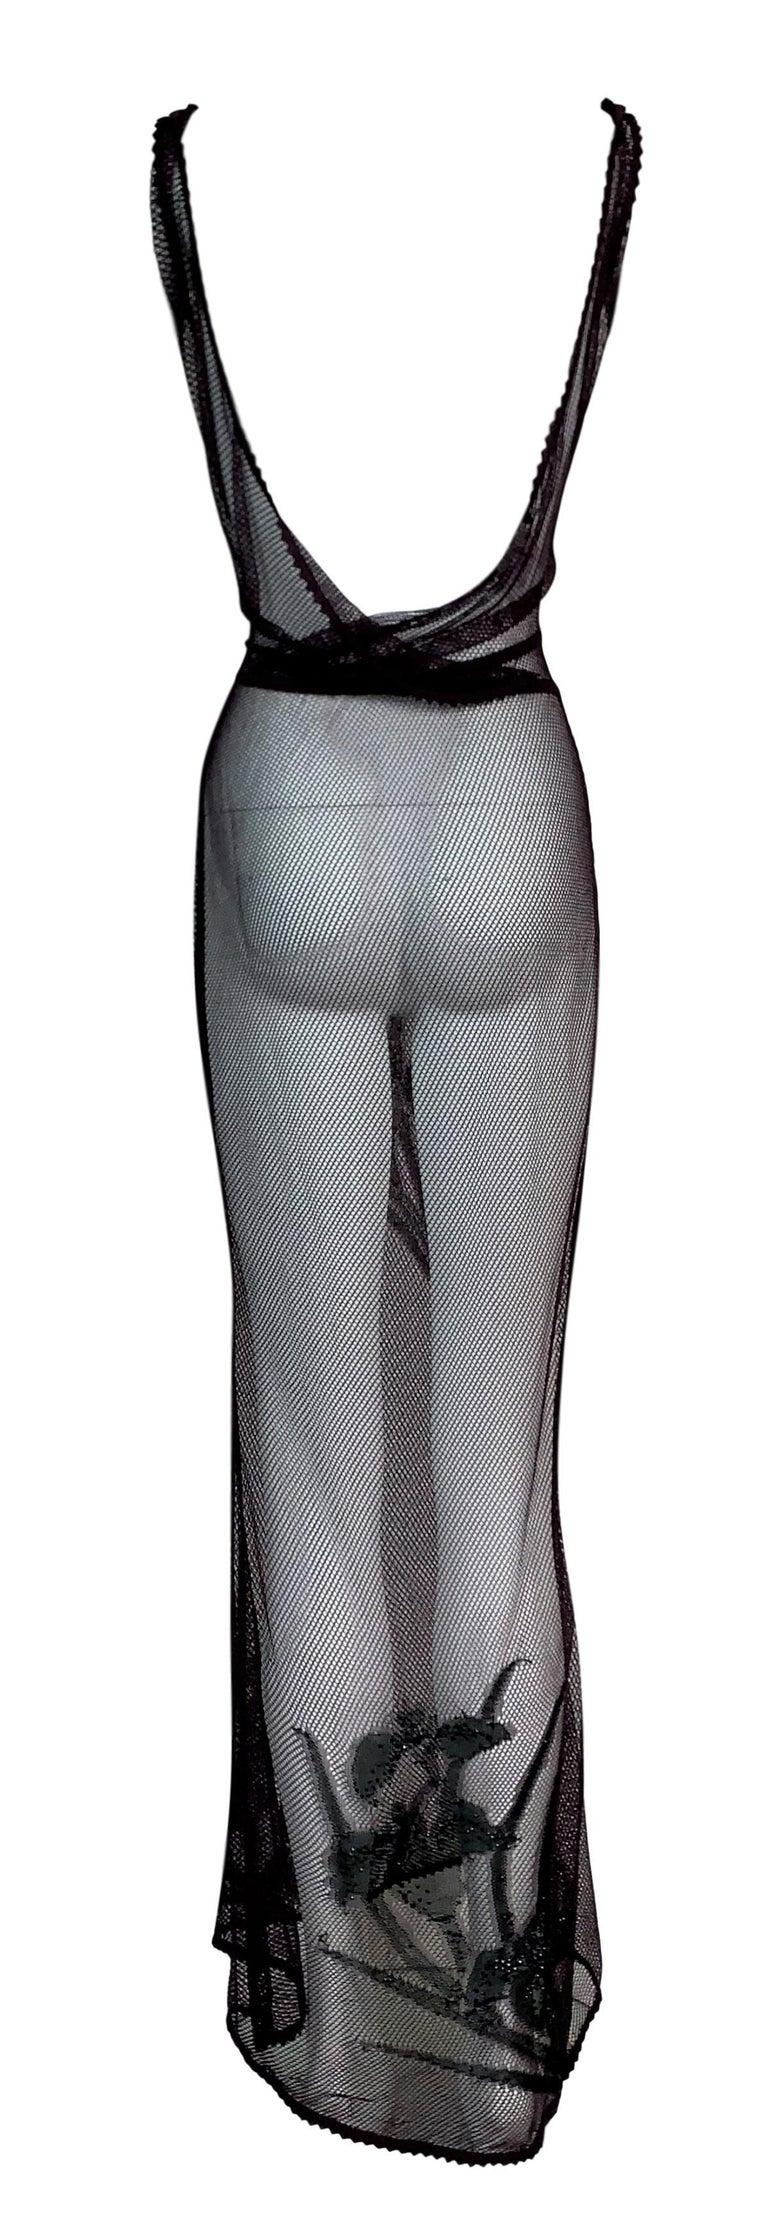 Gray F/W 2000 Christian Dior John Galliano Sheer Fishnet Embellished Maxi Dress For Sale